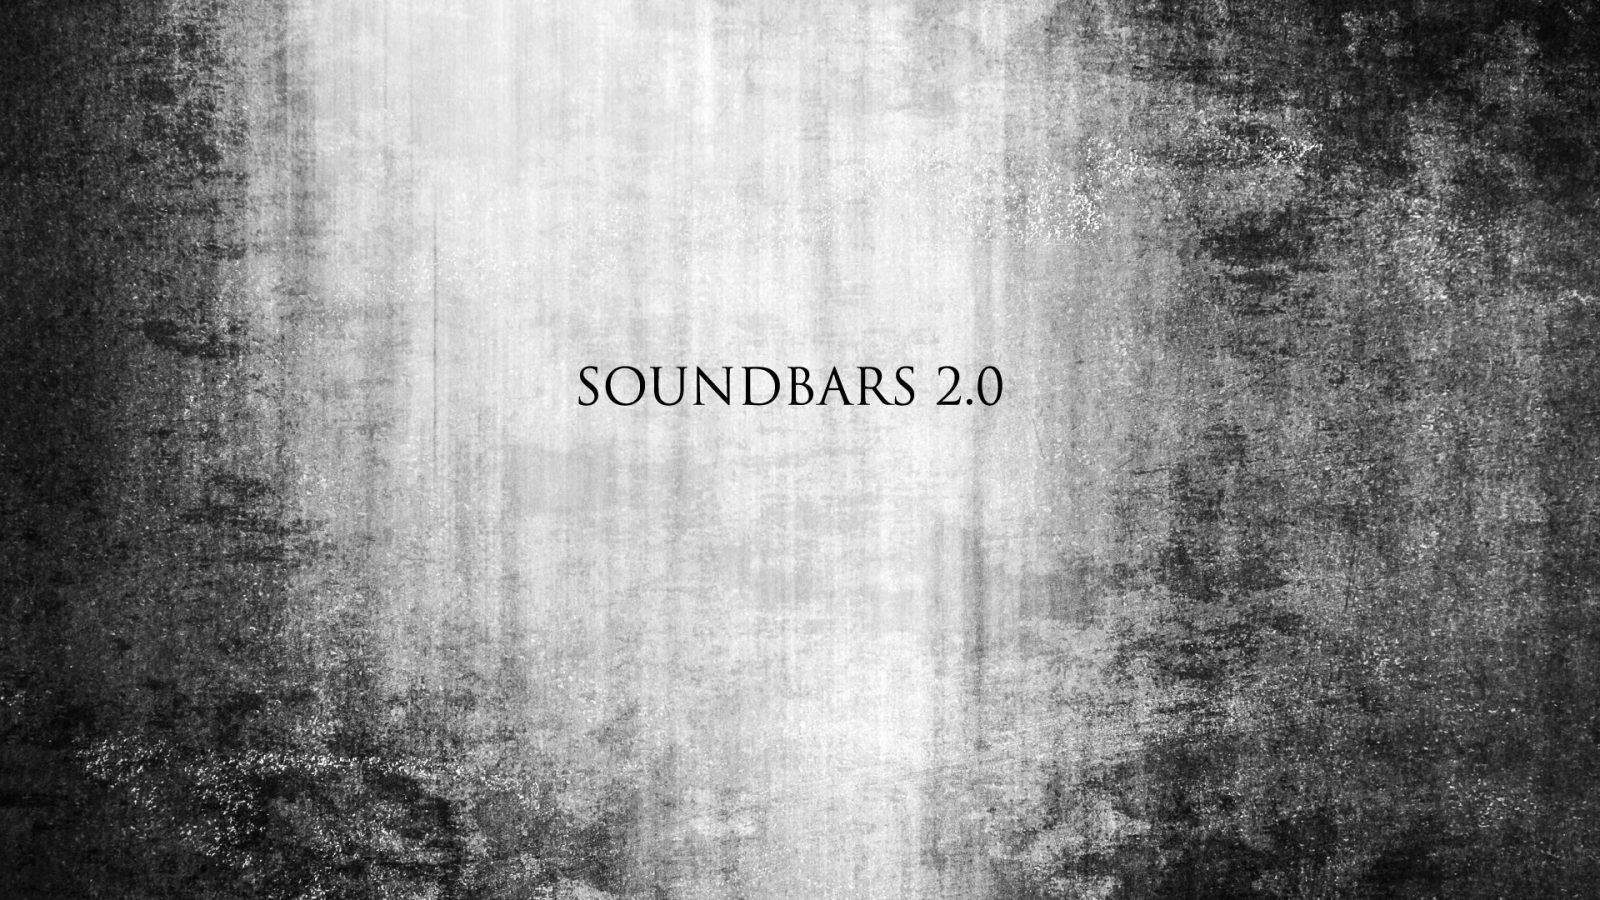 2017 best soundbars